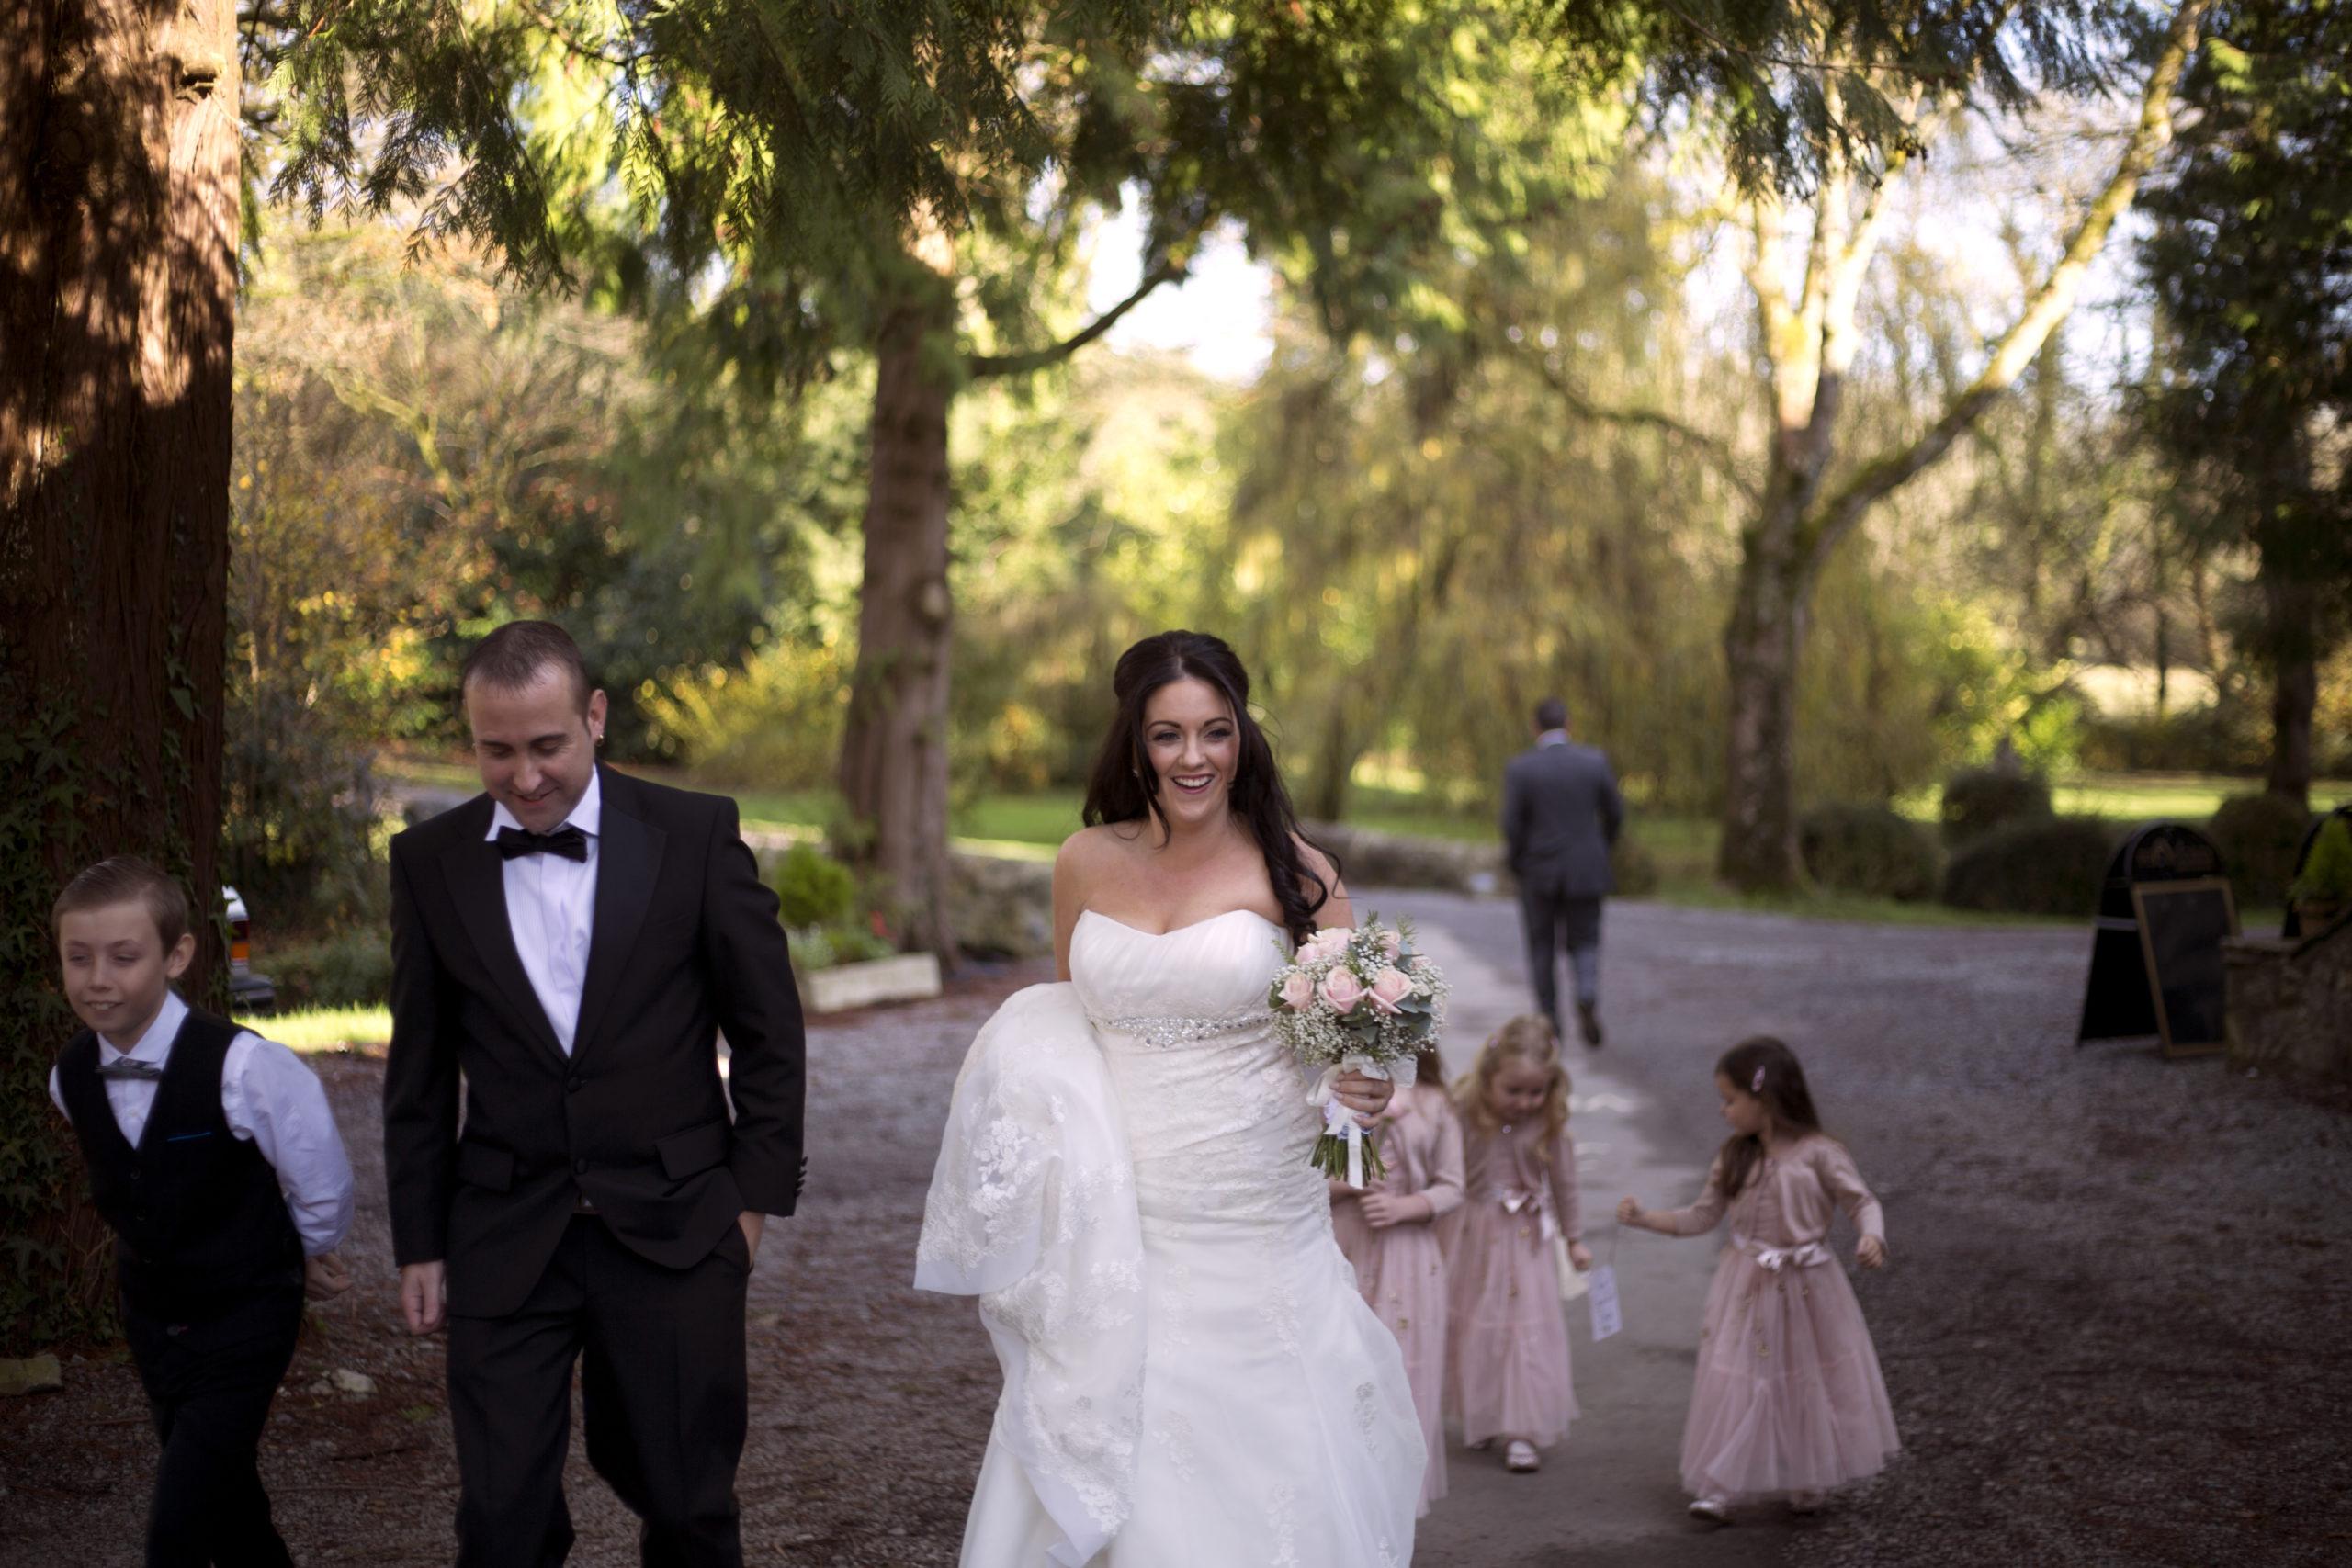 Bride walking to ceremony Pencoed house estate wedding photographer Cardiff